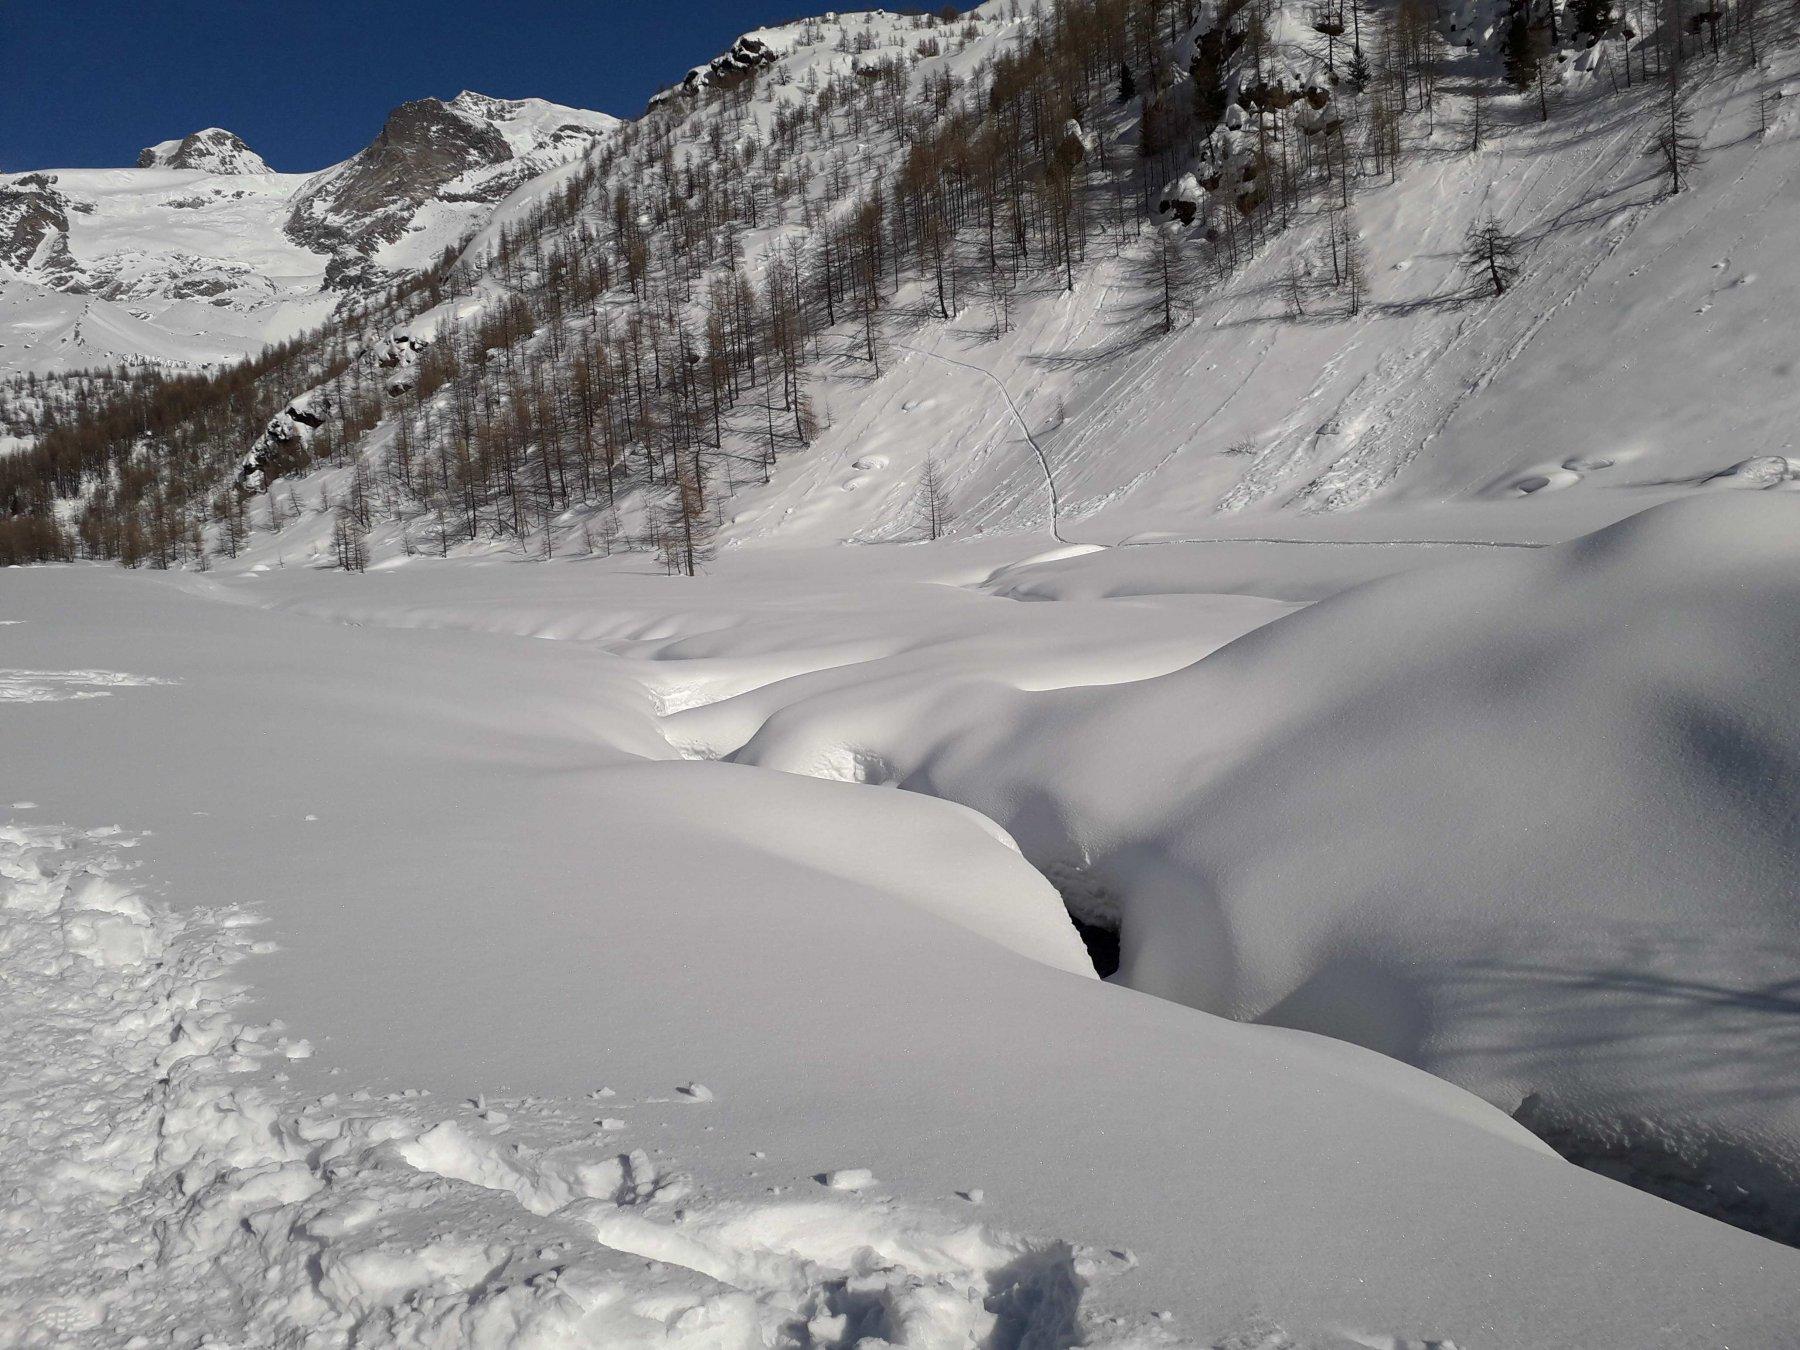 mota neve, panna ai bordi del torrente